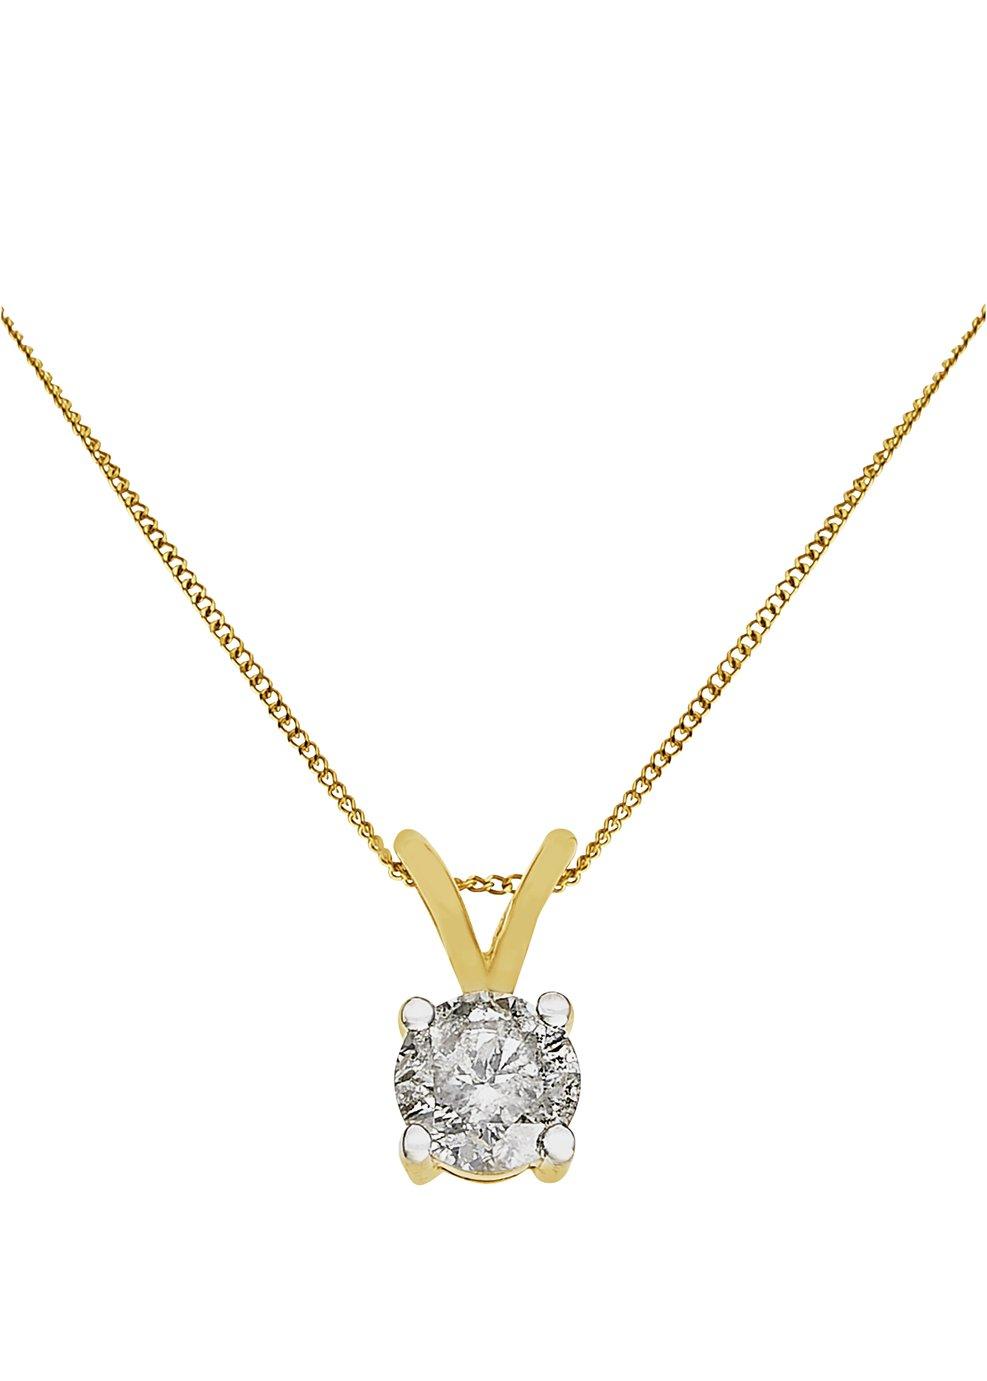 Image of 9 Carat Gold - 0.50 Carat Diamond Solitaire Pendant.